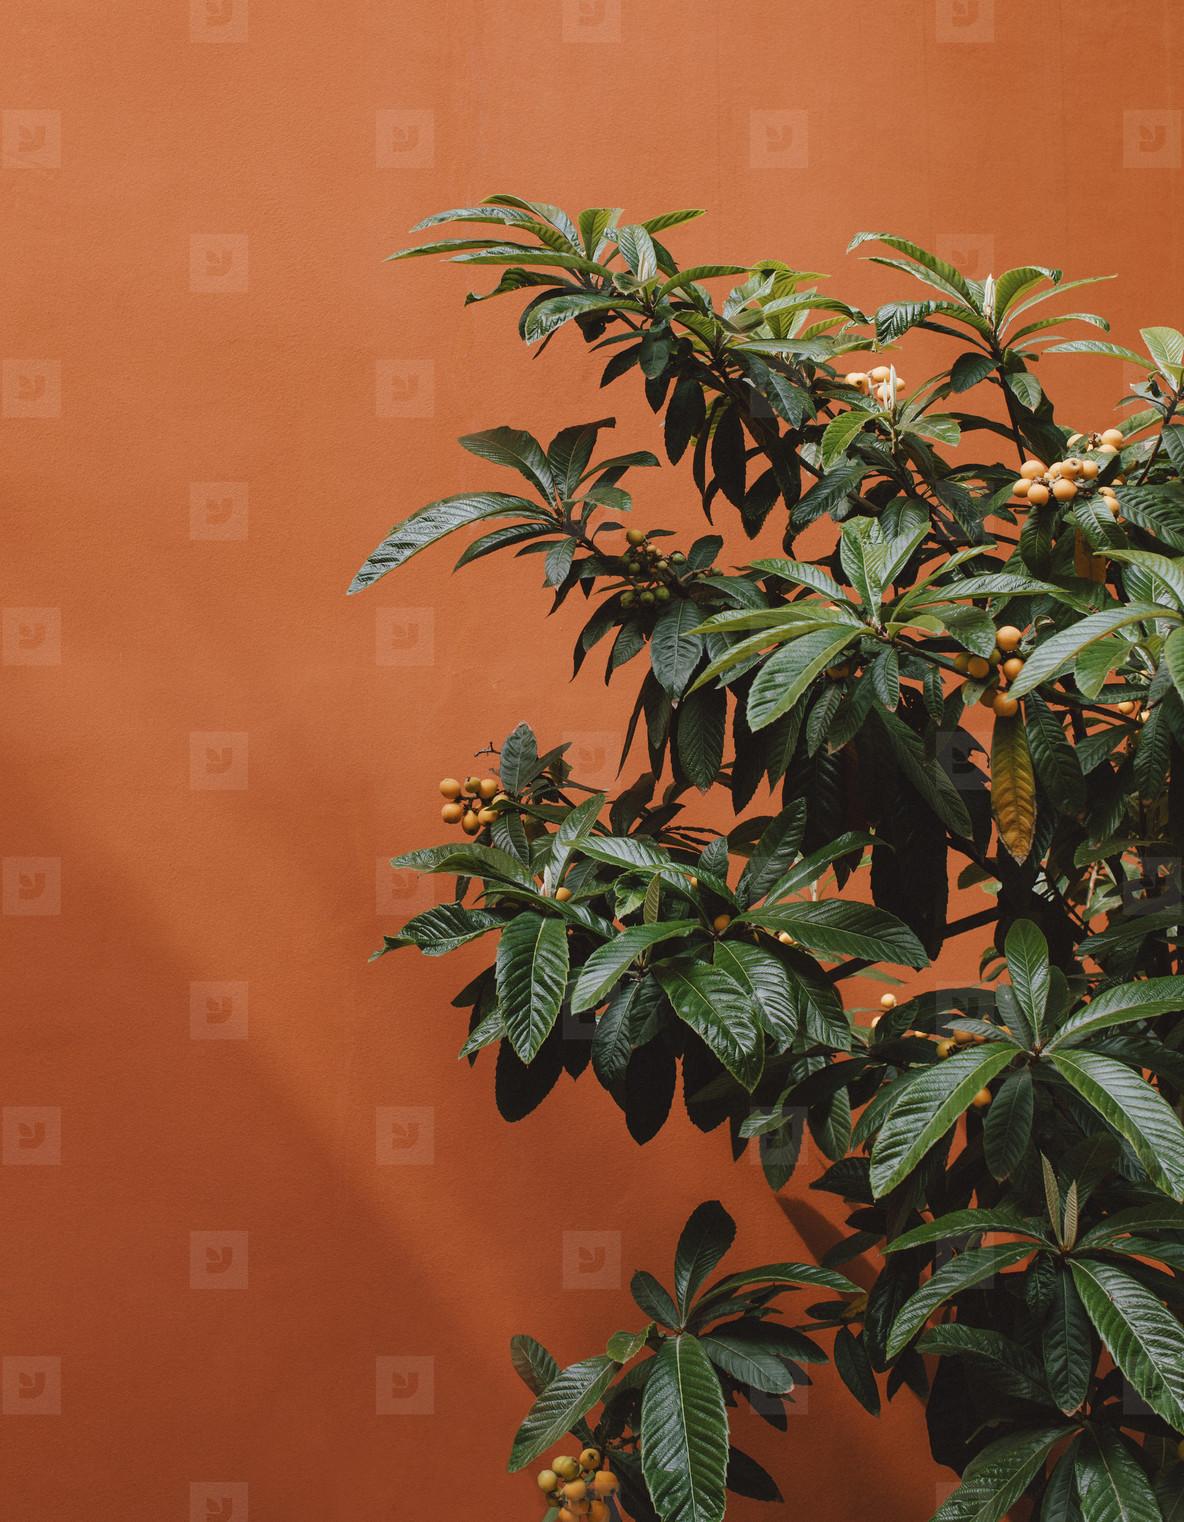 Close up berries growing on bush against orange wall